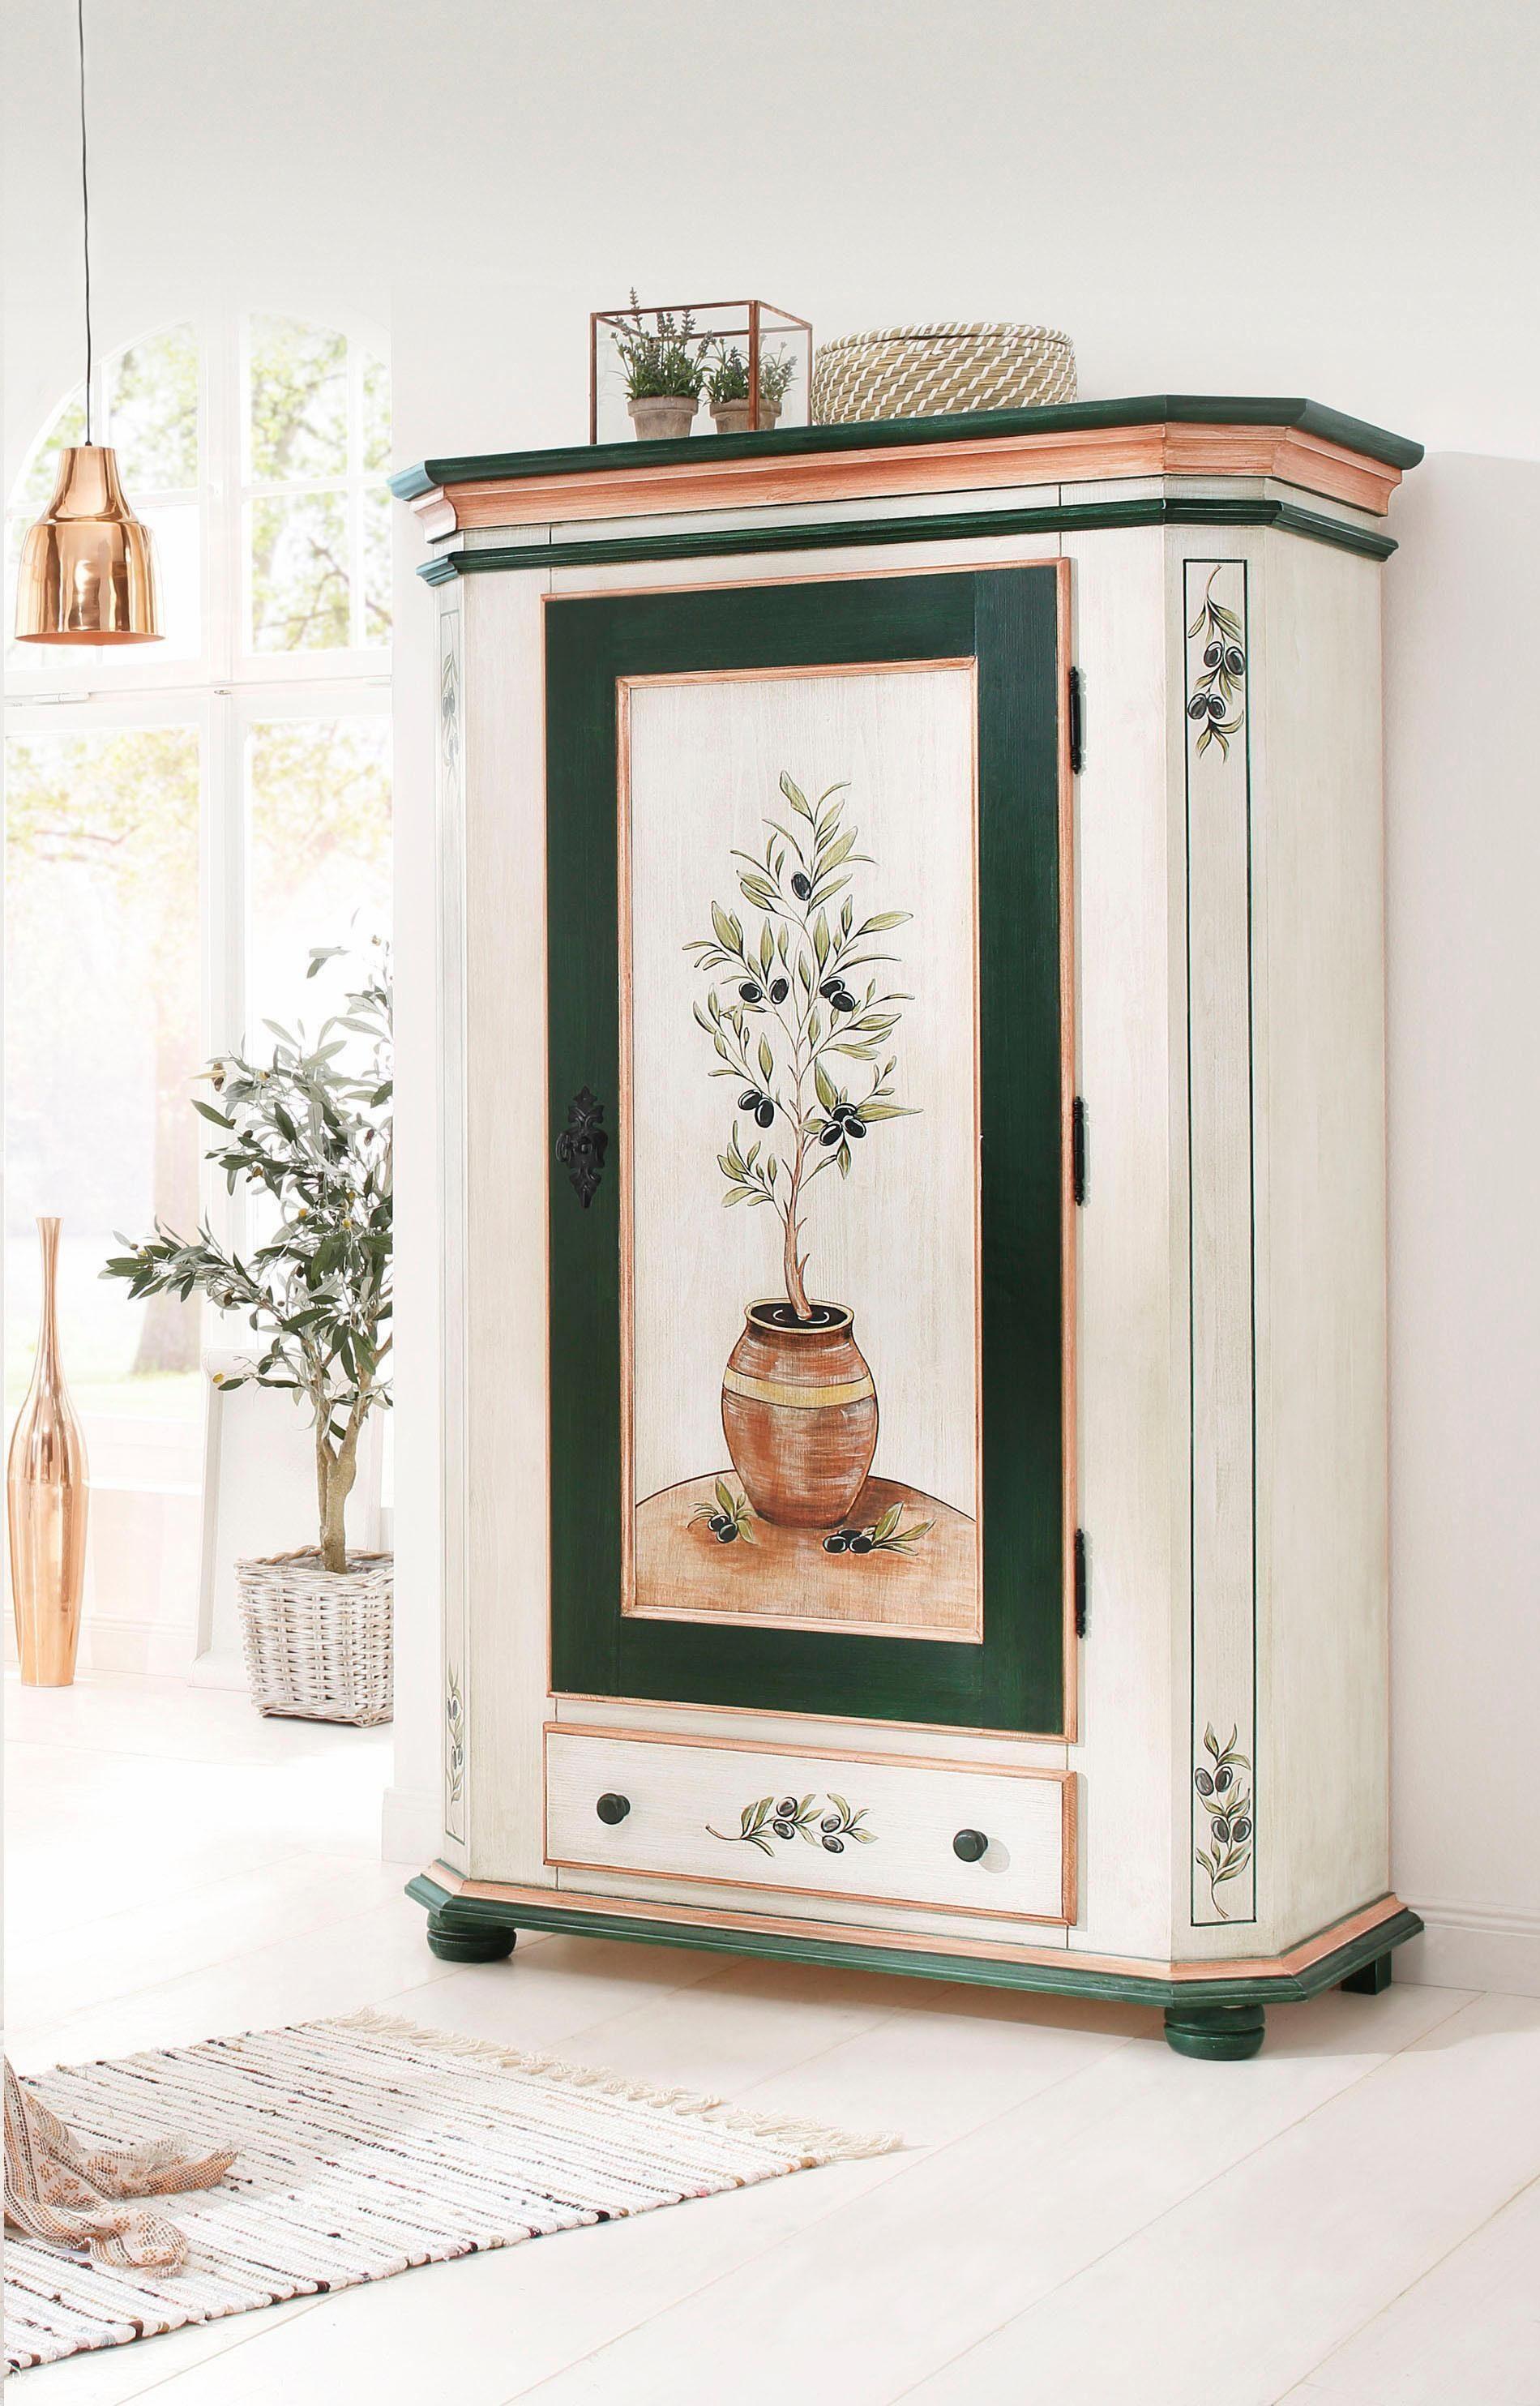 Premium Collection by Home affaire Garderobenschrank »Olive«